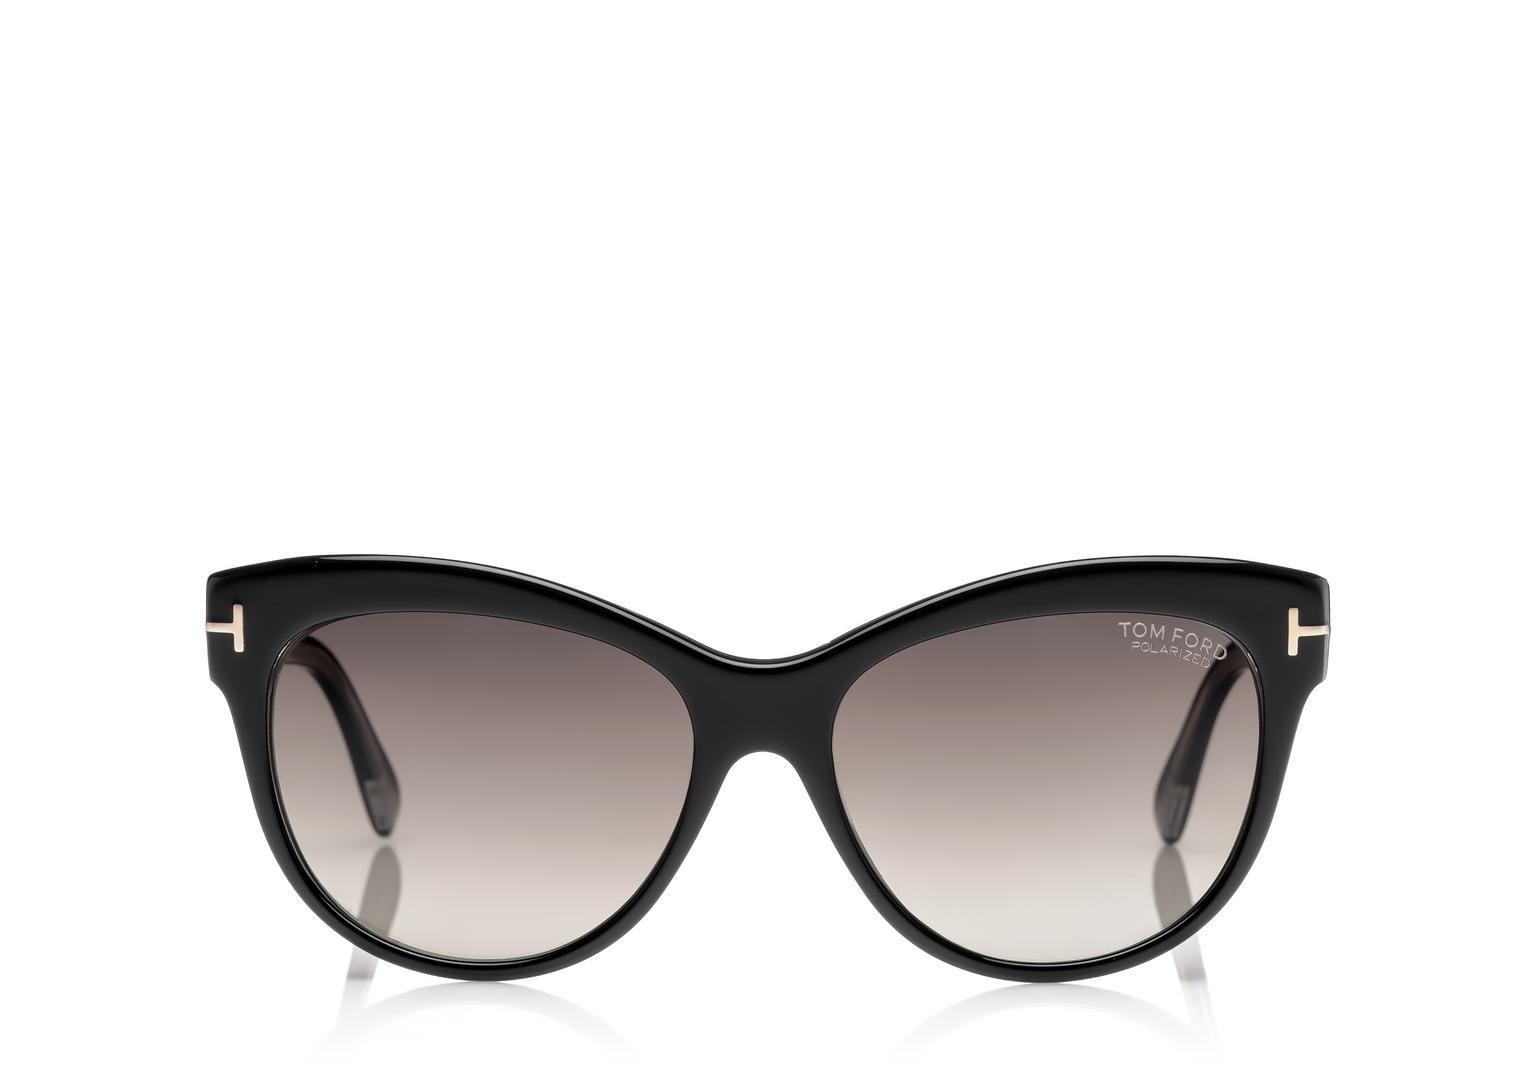 women great tom ford selection womens eyewear frames cat glasses eye accessories